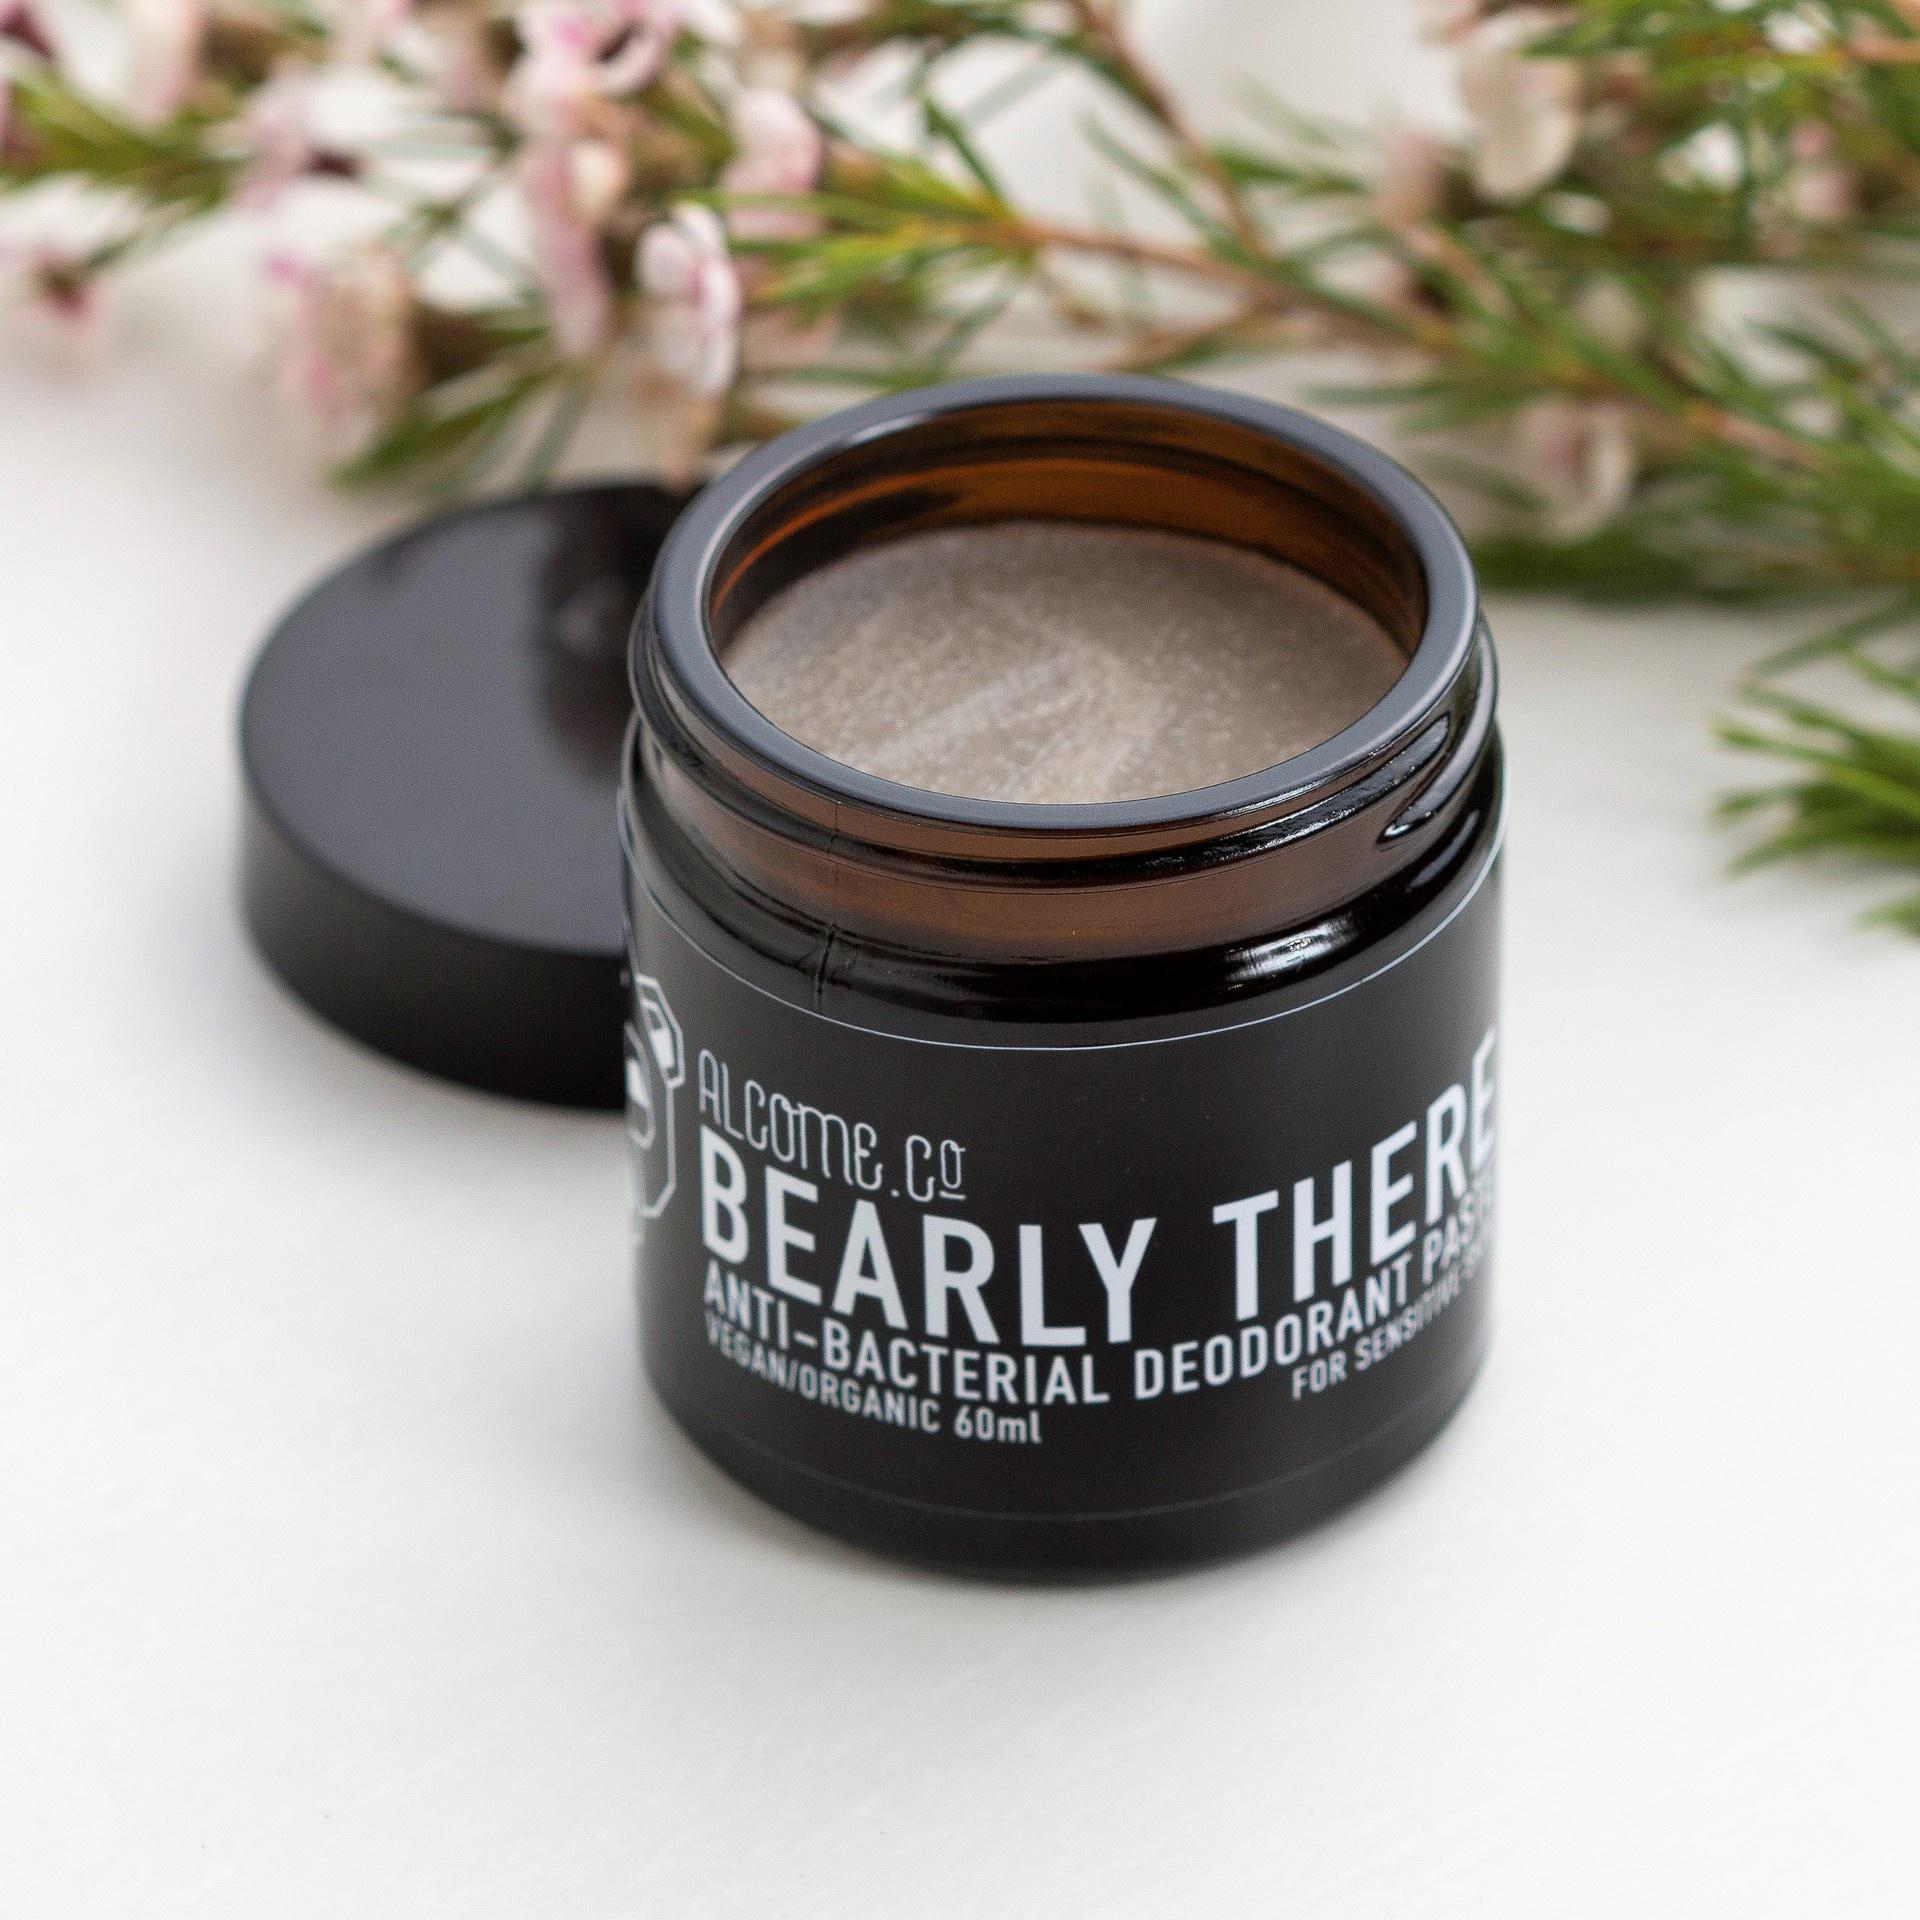 Organic Bi-Carb Free Deodorant / Bearly There / Sensitive Skin Types / Vegan Organic Natural